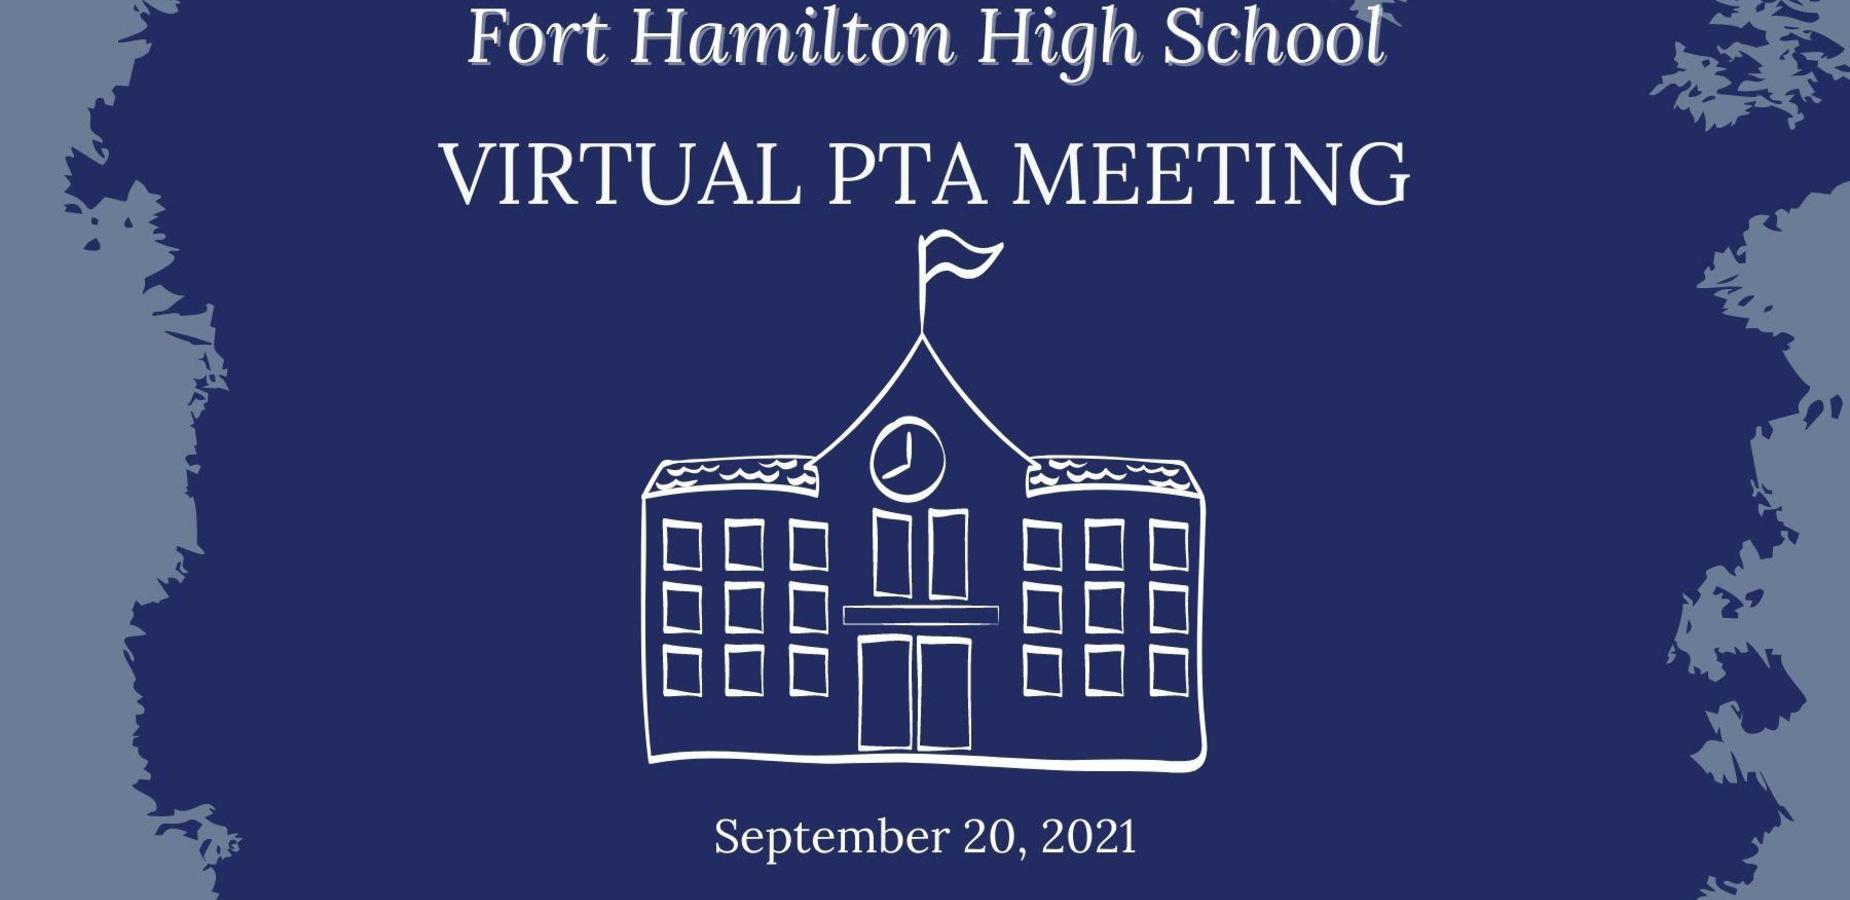 Fort Hamilton High School. Virtual PTA Meeting. September 20, 2021. A drawing of a school building.